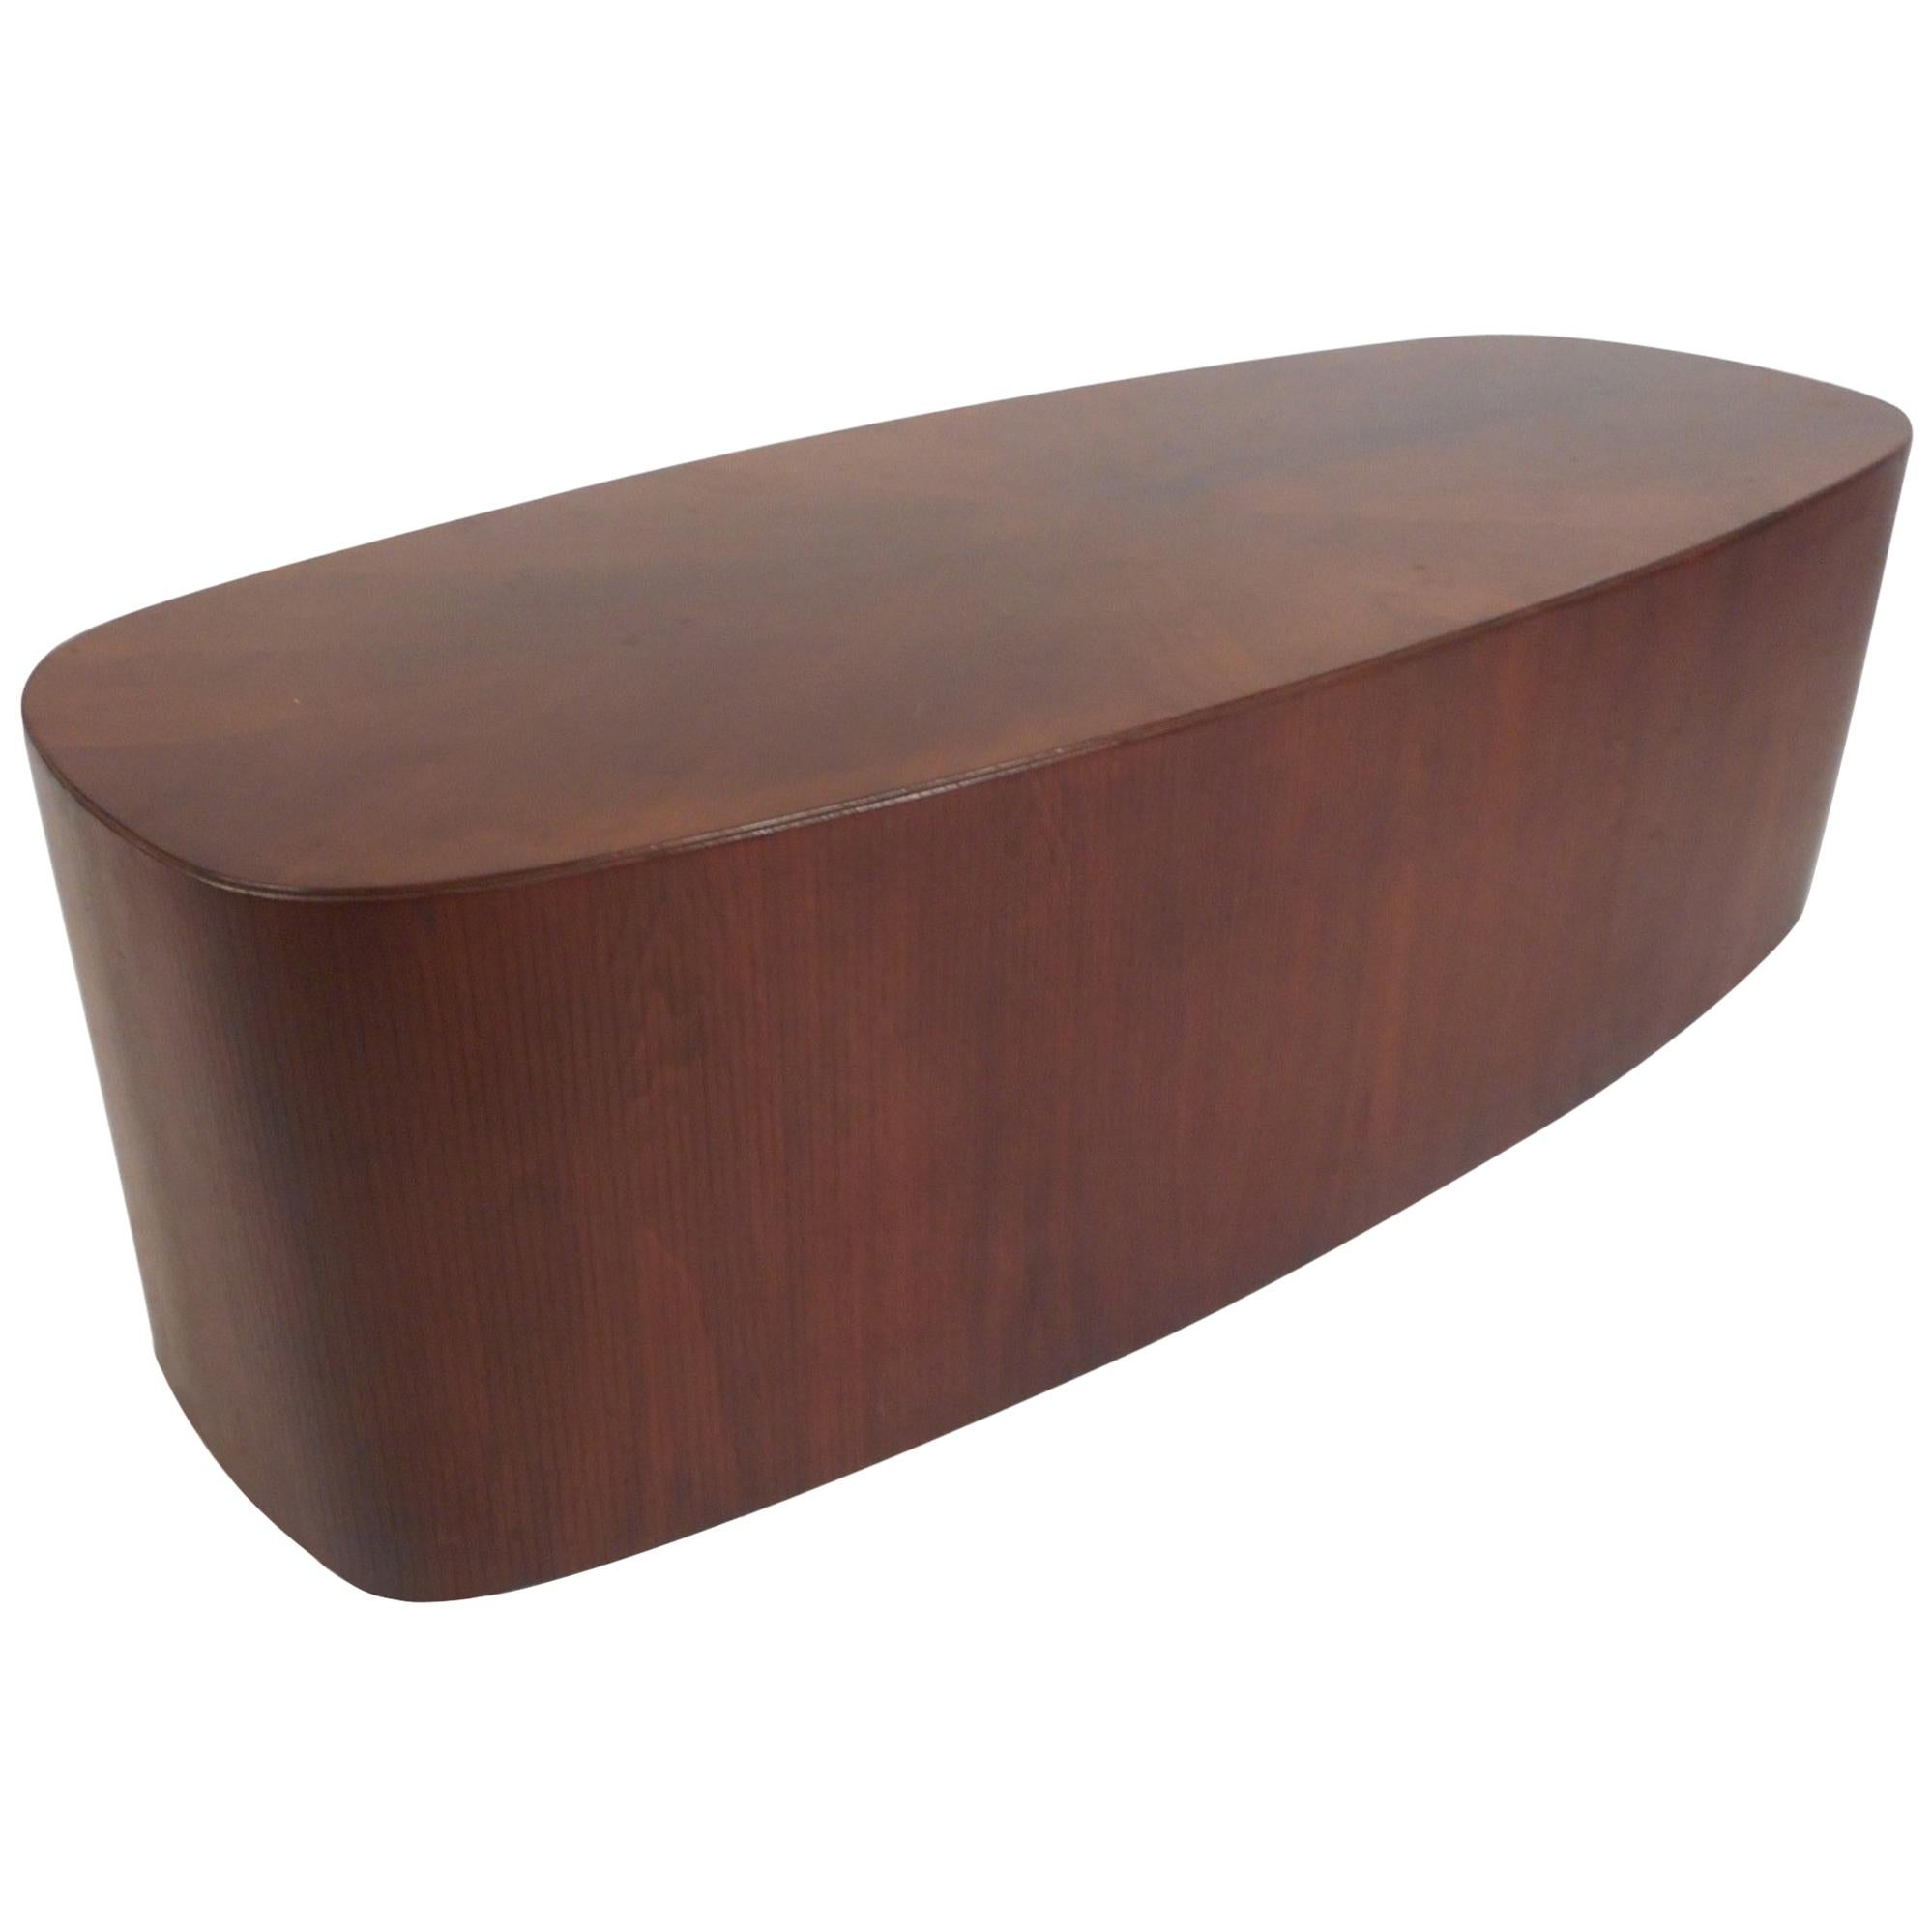 Incroyable Mid Century Modern Oval Coffee Table